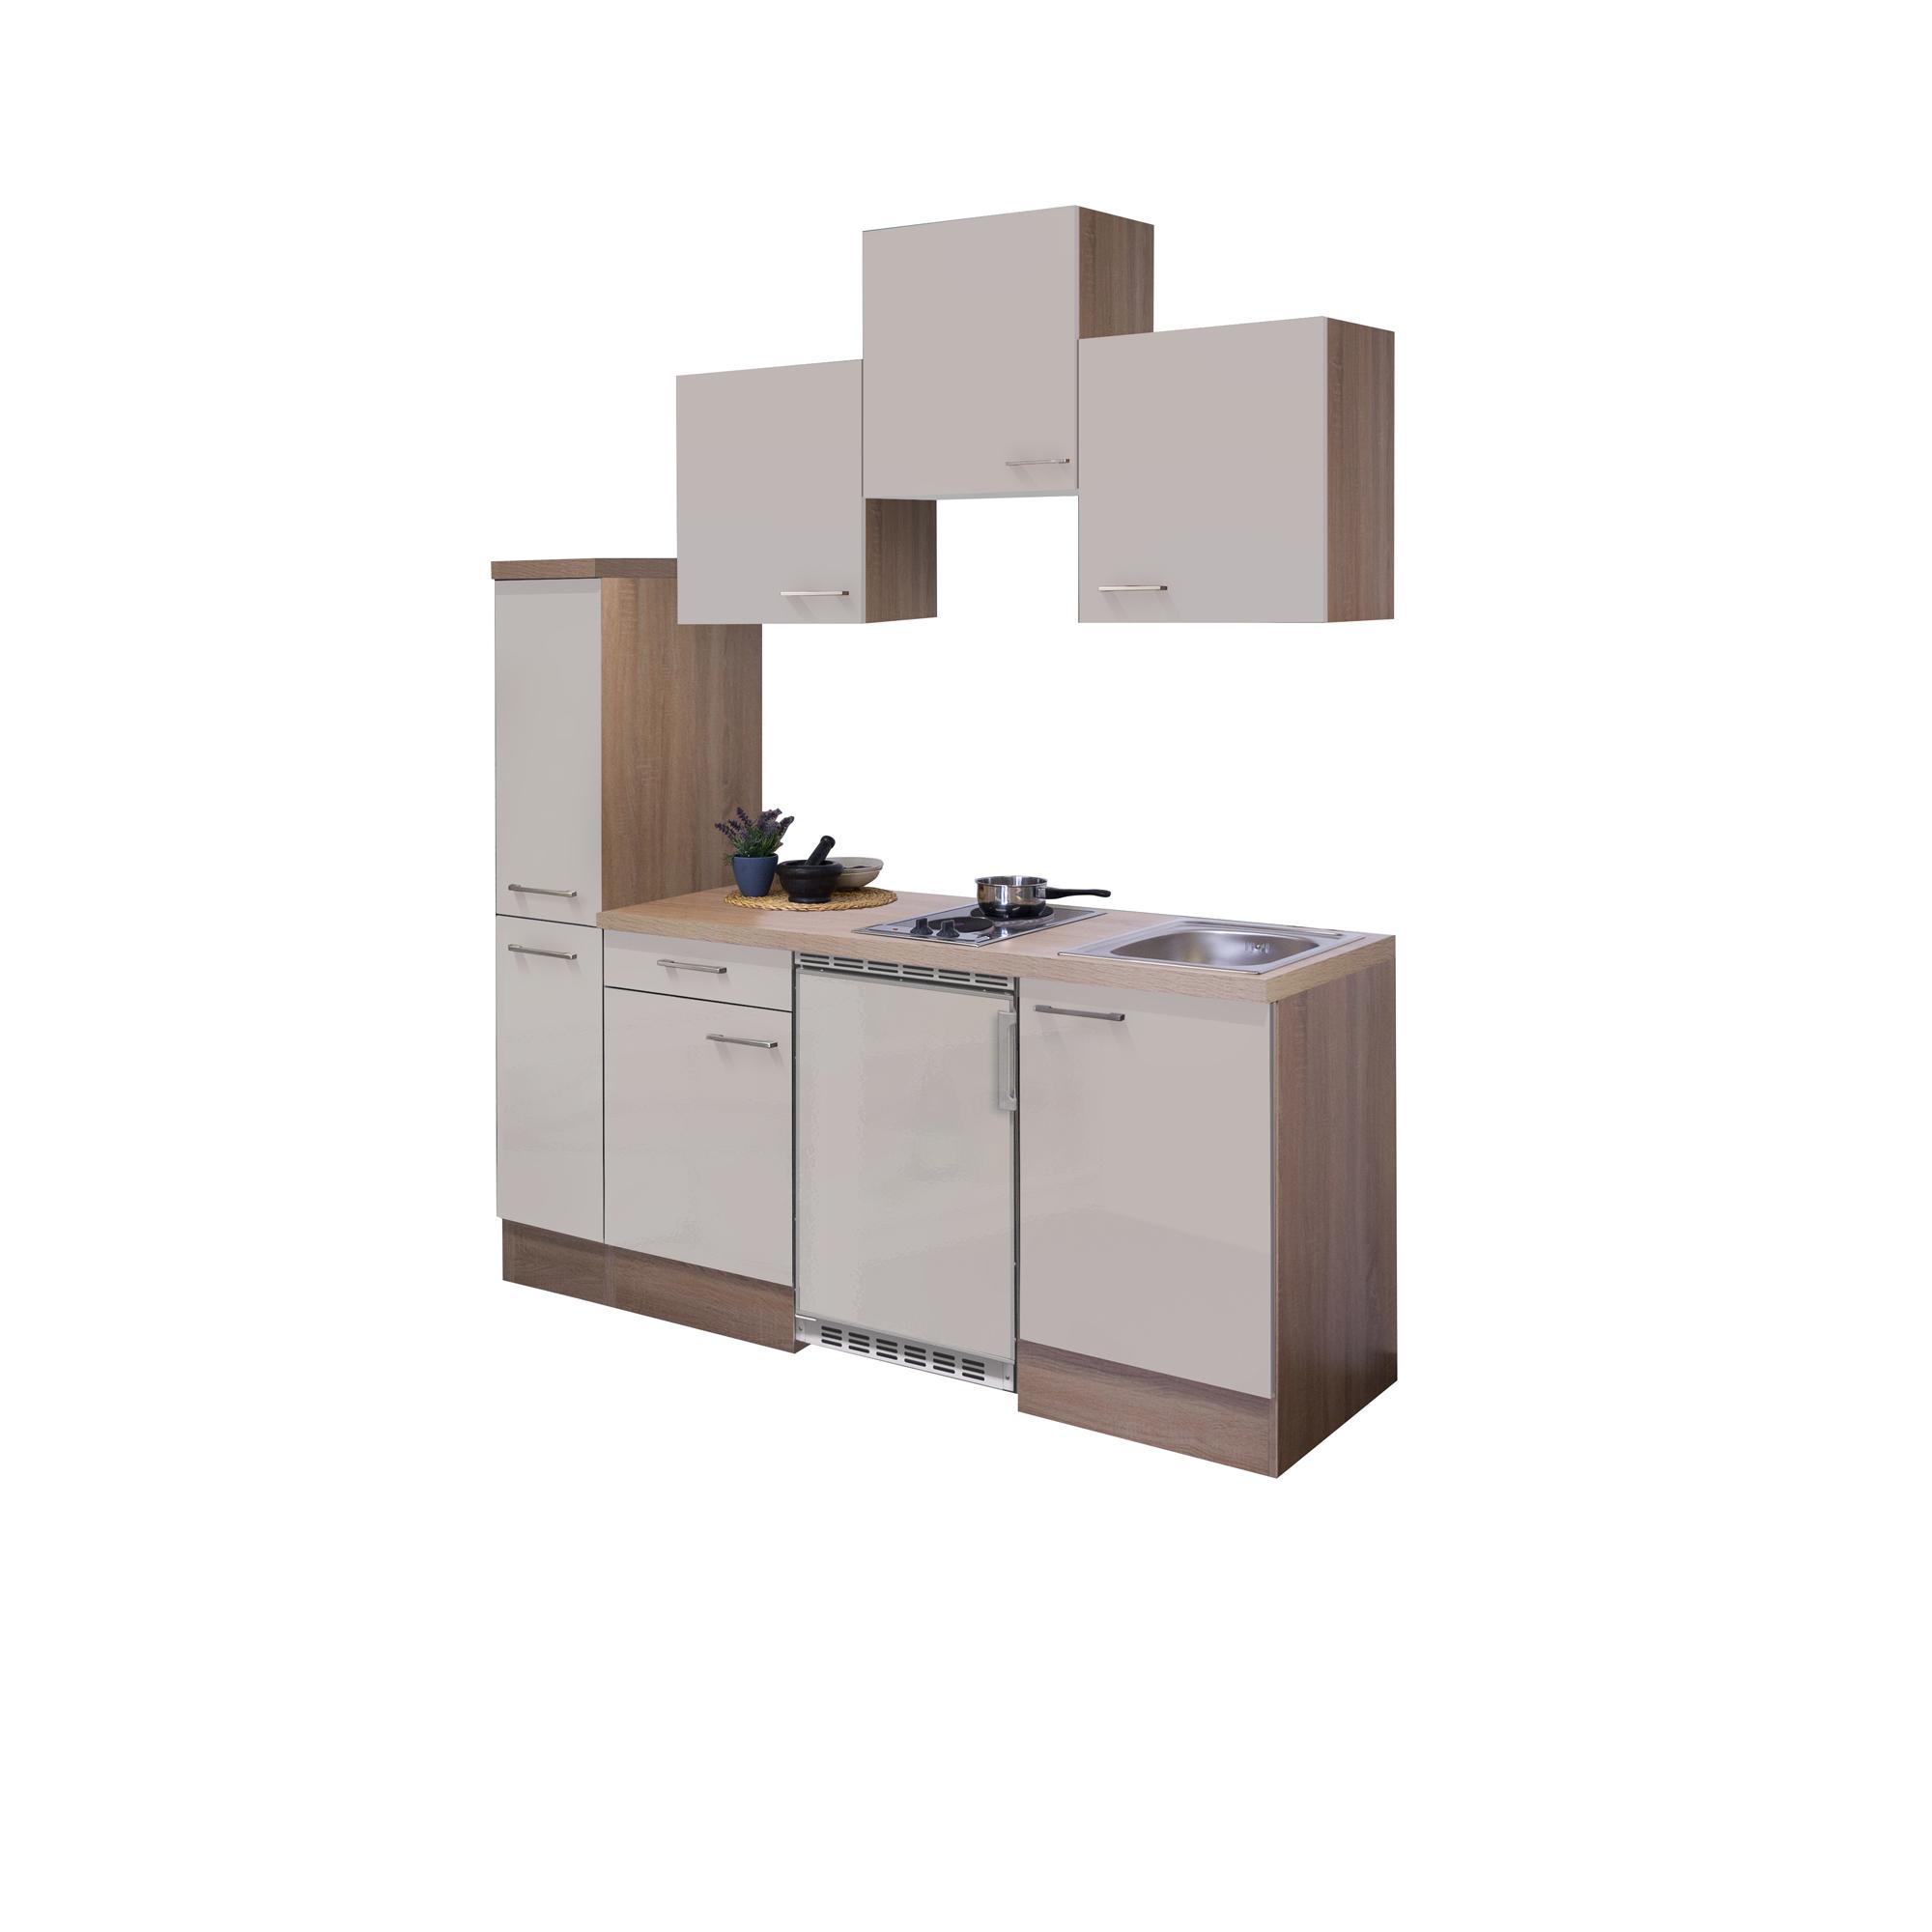 singlek che nepal 10 teilig 180 cm breit creme gl nzend k che singlek chen. Black Bedroom Furniture Sets. Home Design Ideas